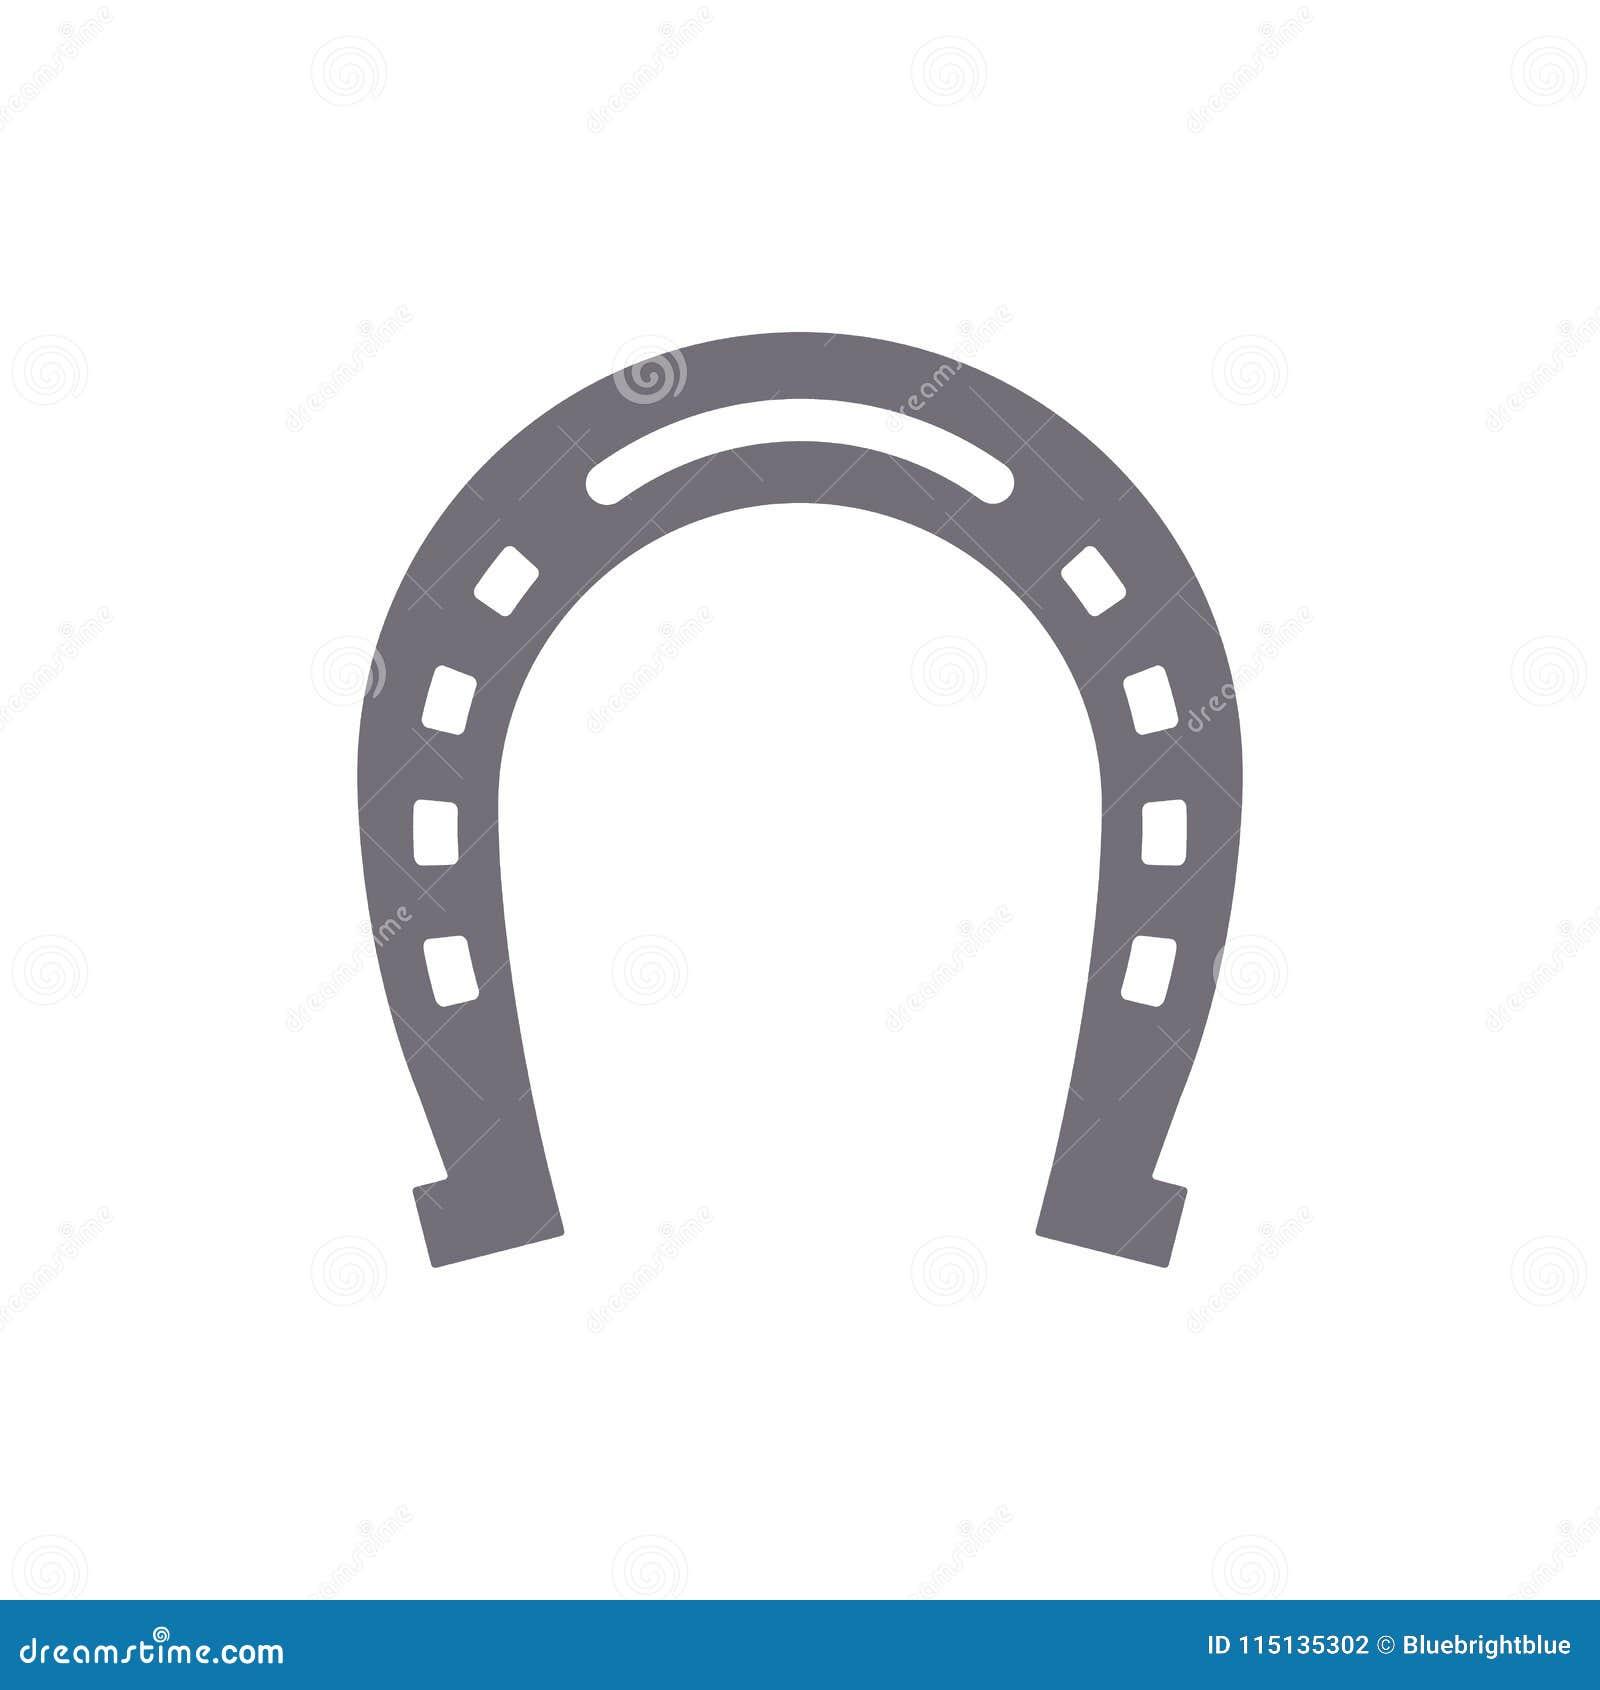 Horseshoe Good Luck Symbol Isolated Stock Vector Illustration Of